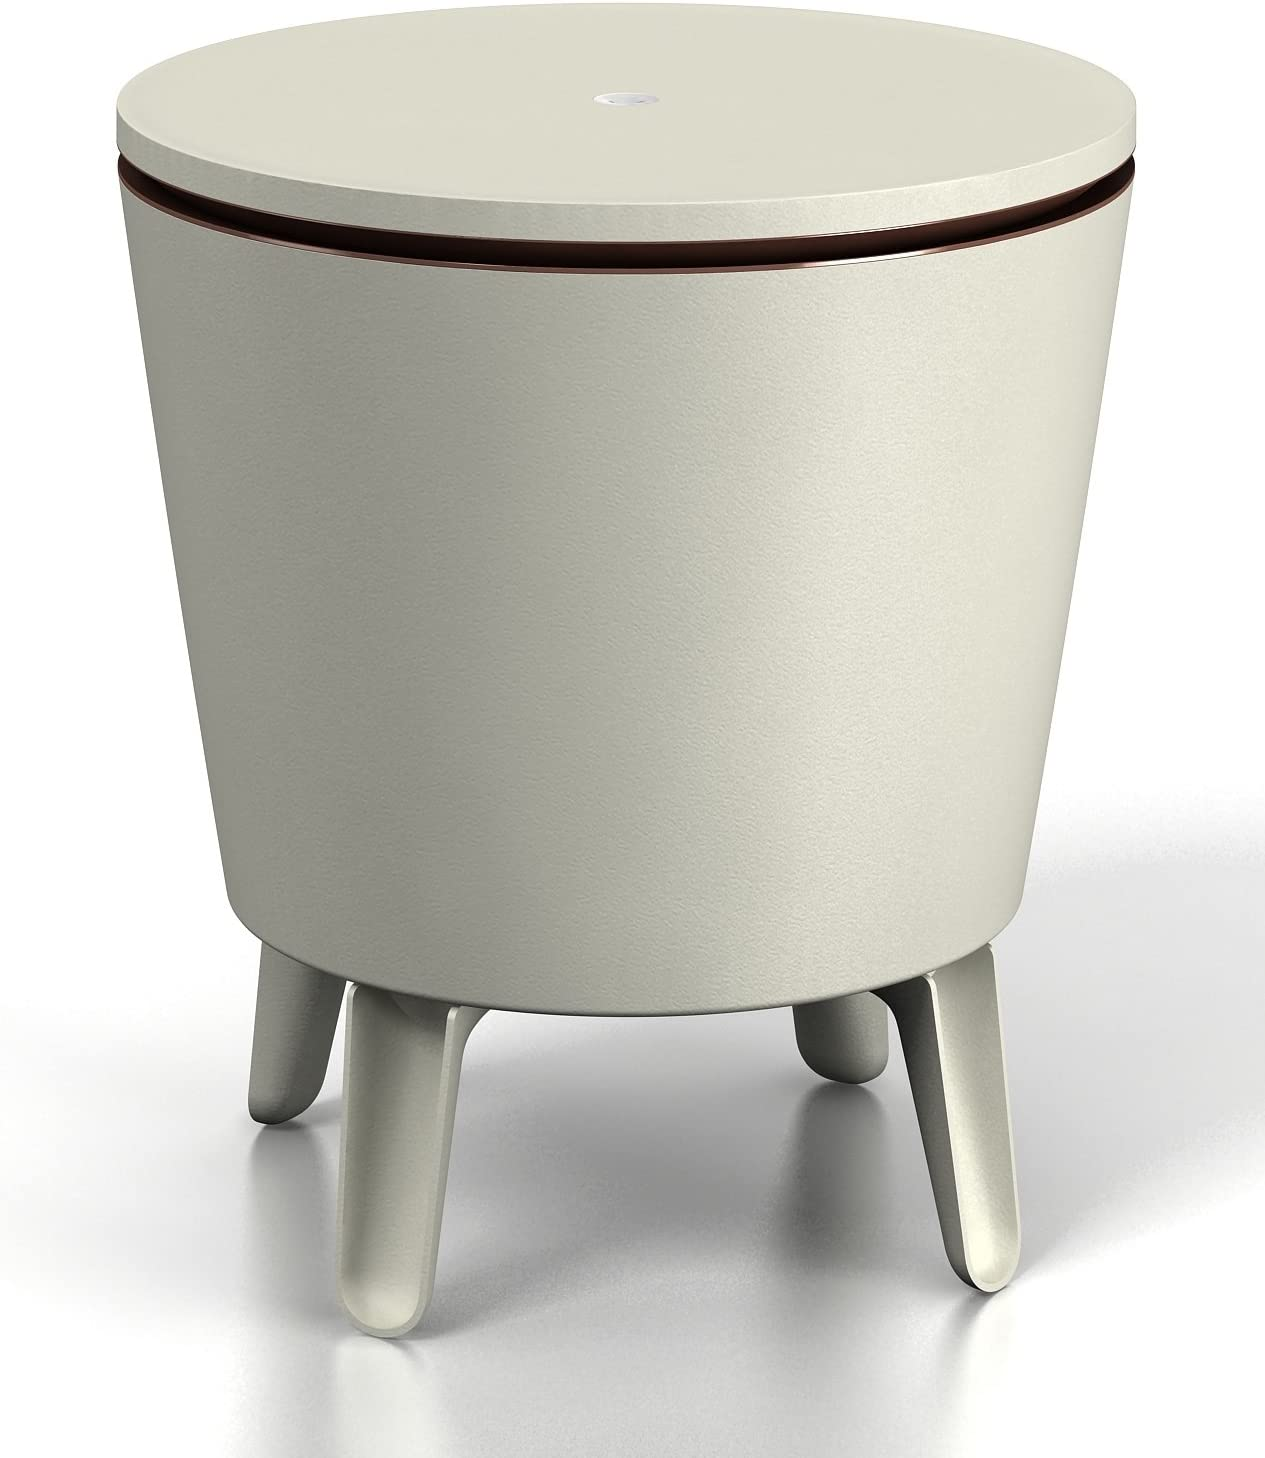 Keter Cool Bar Crema y Chocolate Mesa nevera para exterior, Blanco/marrón, 50x41x50 cm